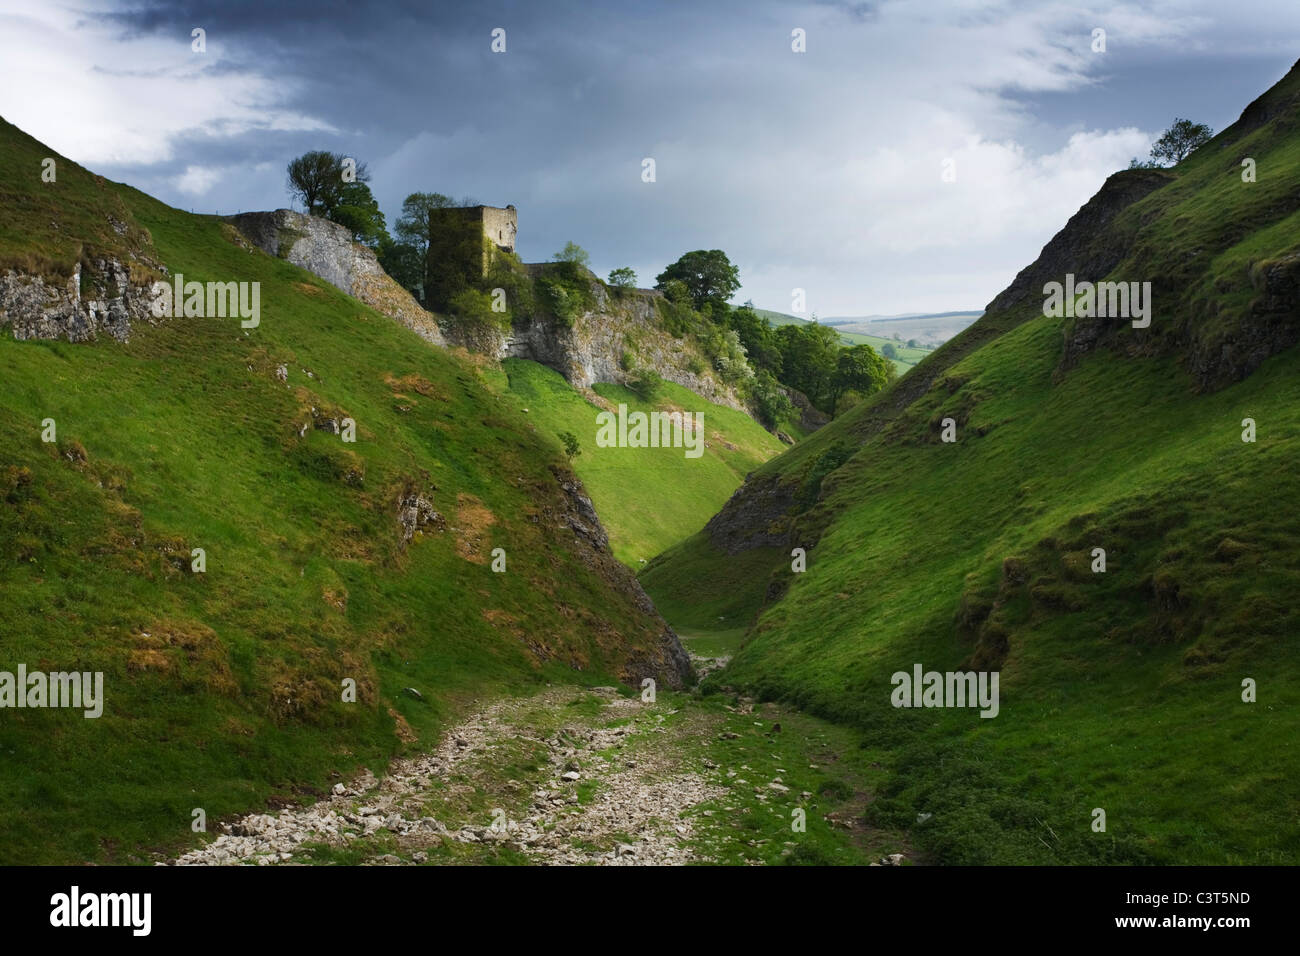 Cave Dale and Peveril Castle, Castleton. Peak District National Park. Derbyshire. England. UK. - Stock Image